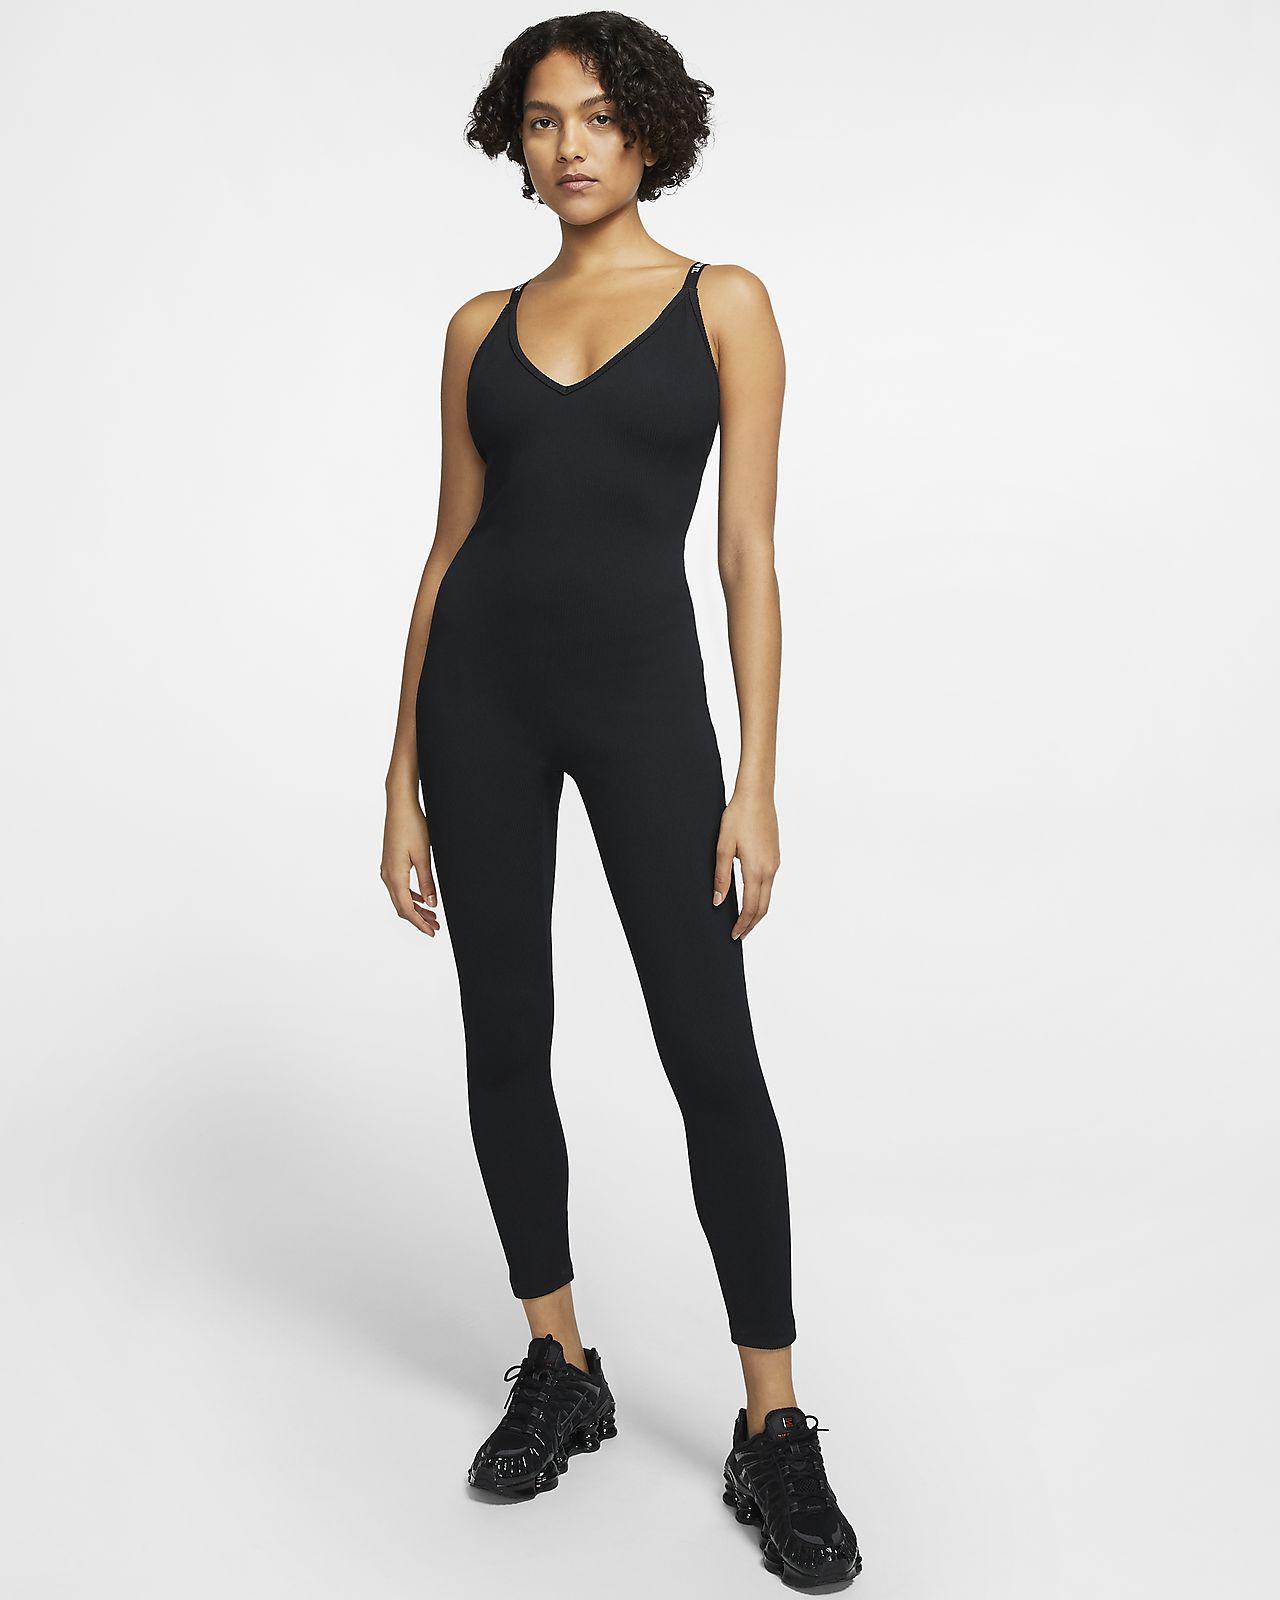 Combinaison côtelée Nike Sportswear JDI pour Femme